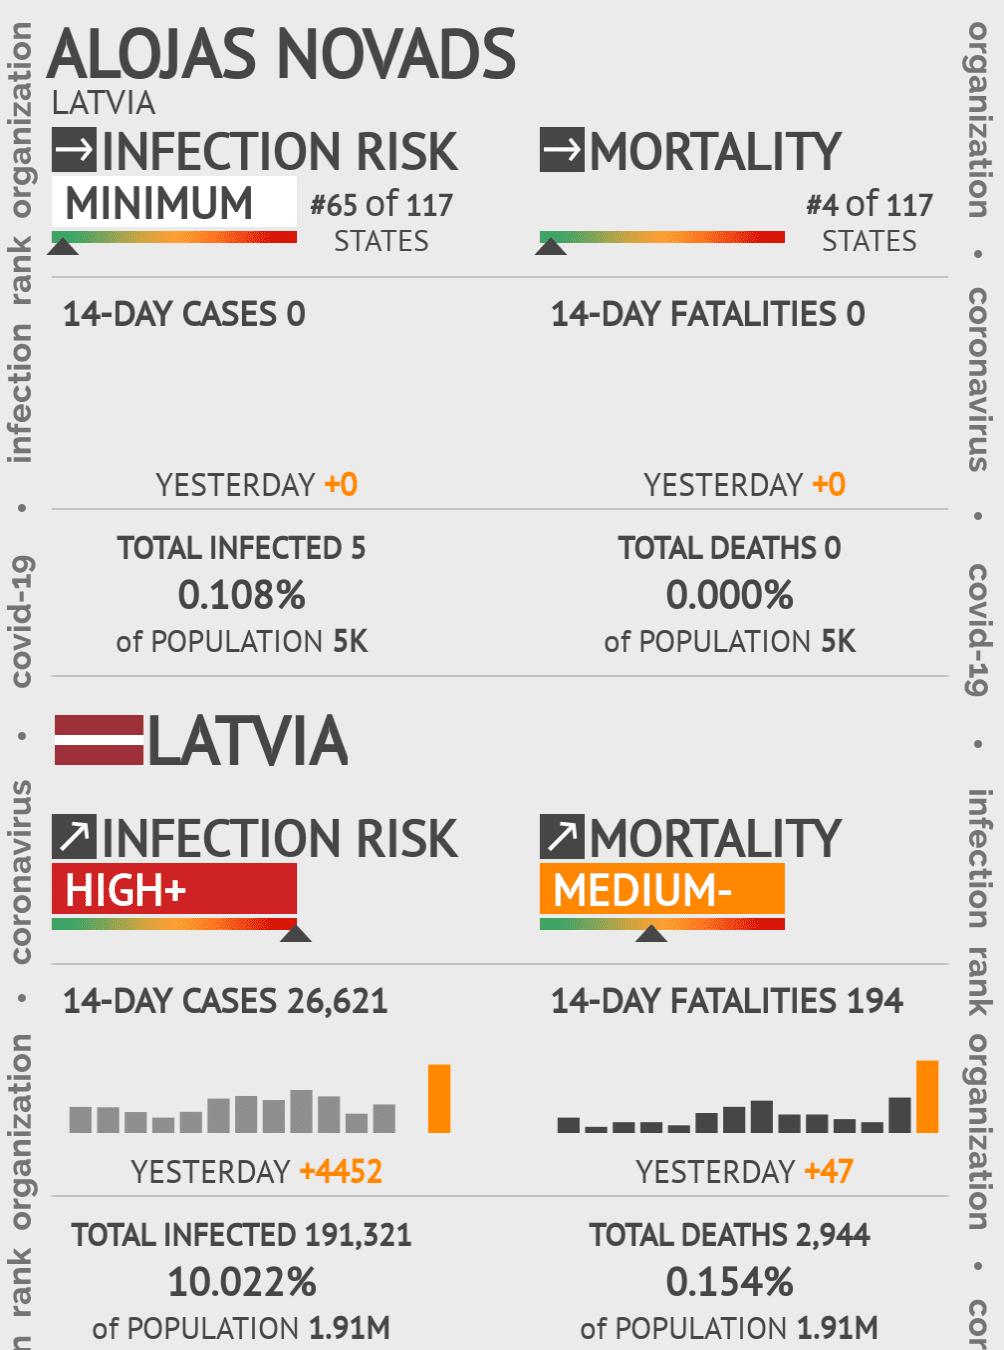 Alojas novads Coronavirus Covid-19 Risk of Infection on May 14, 2020